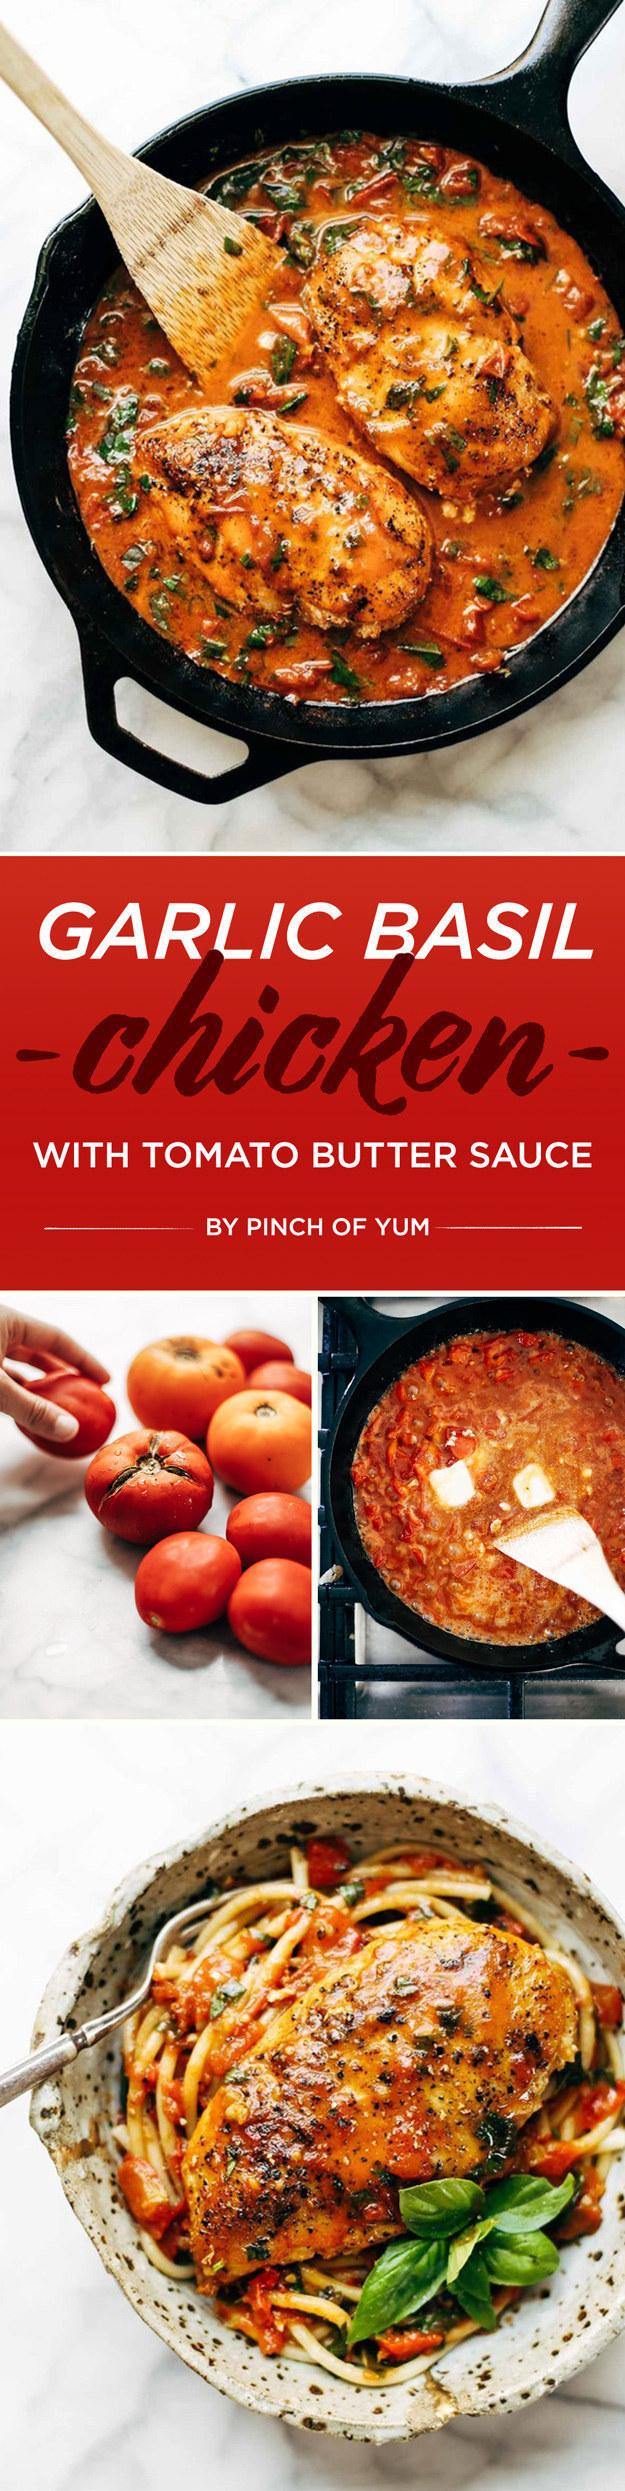 7 easy chicken dinners tasty